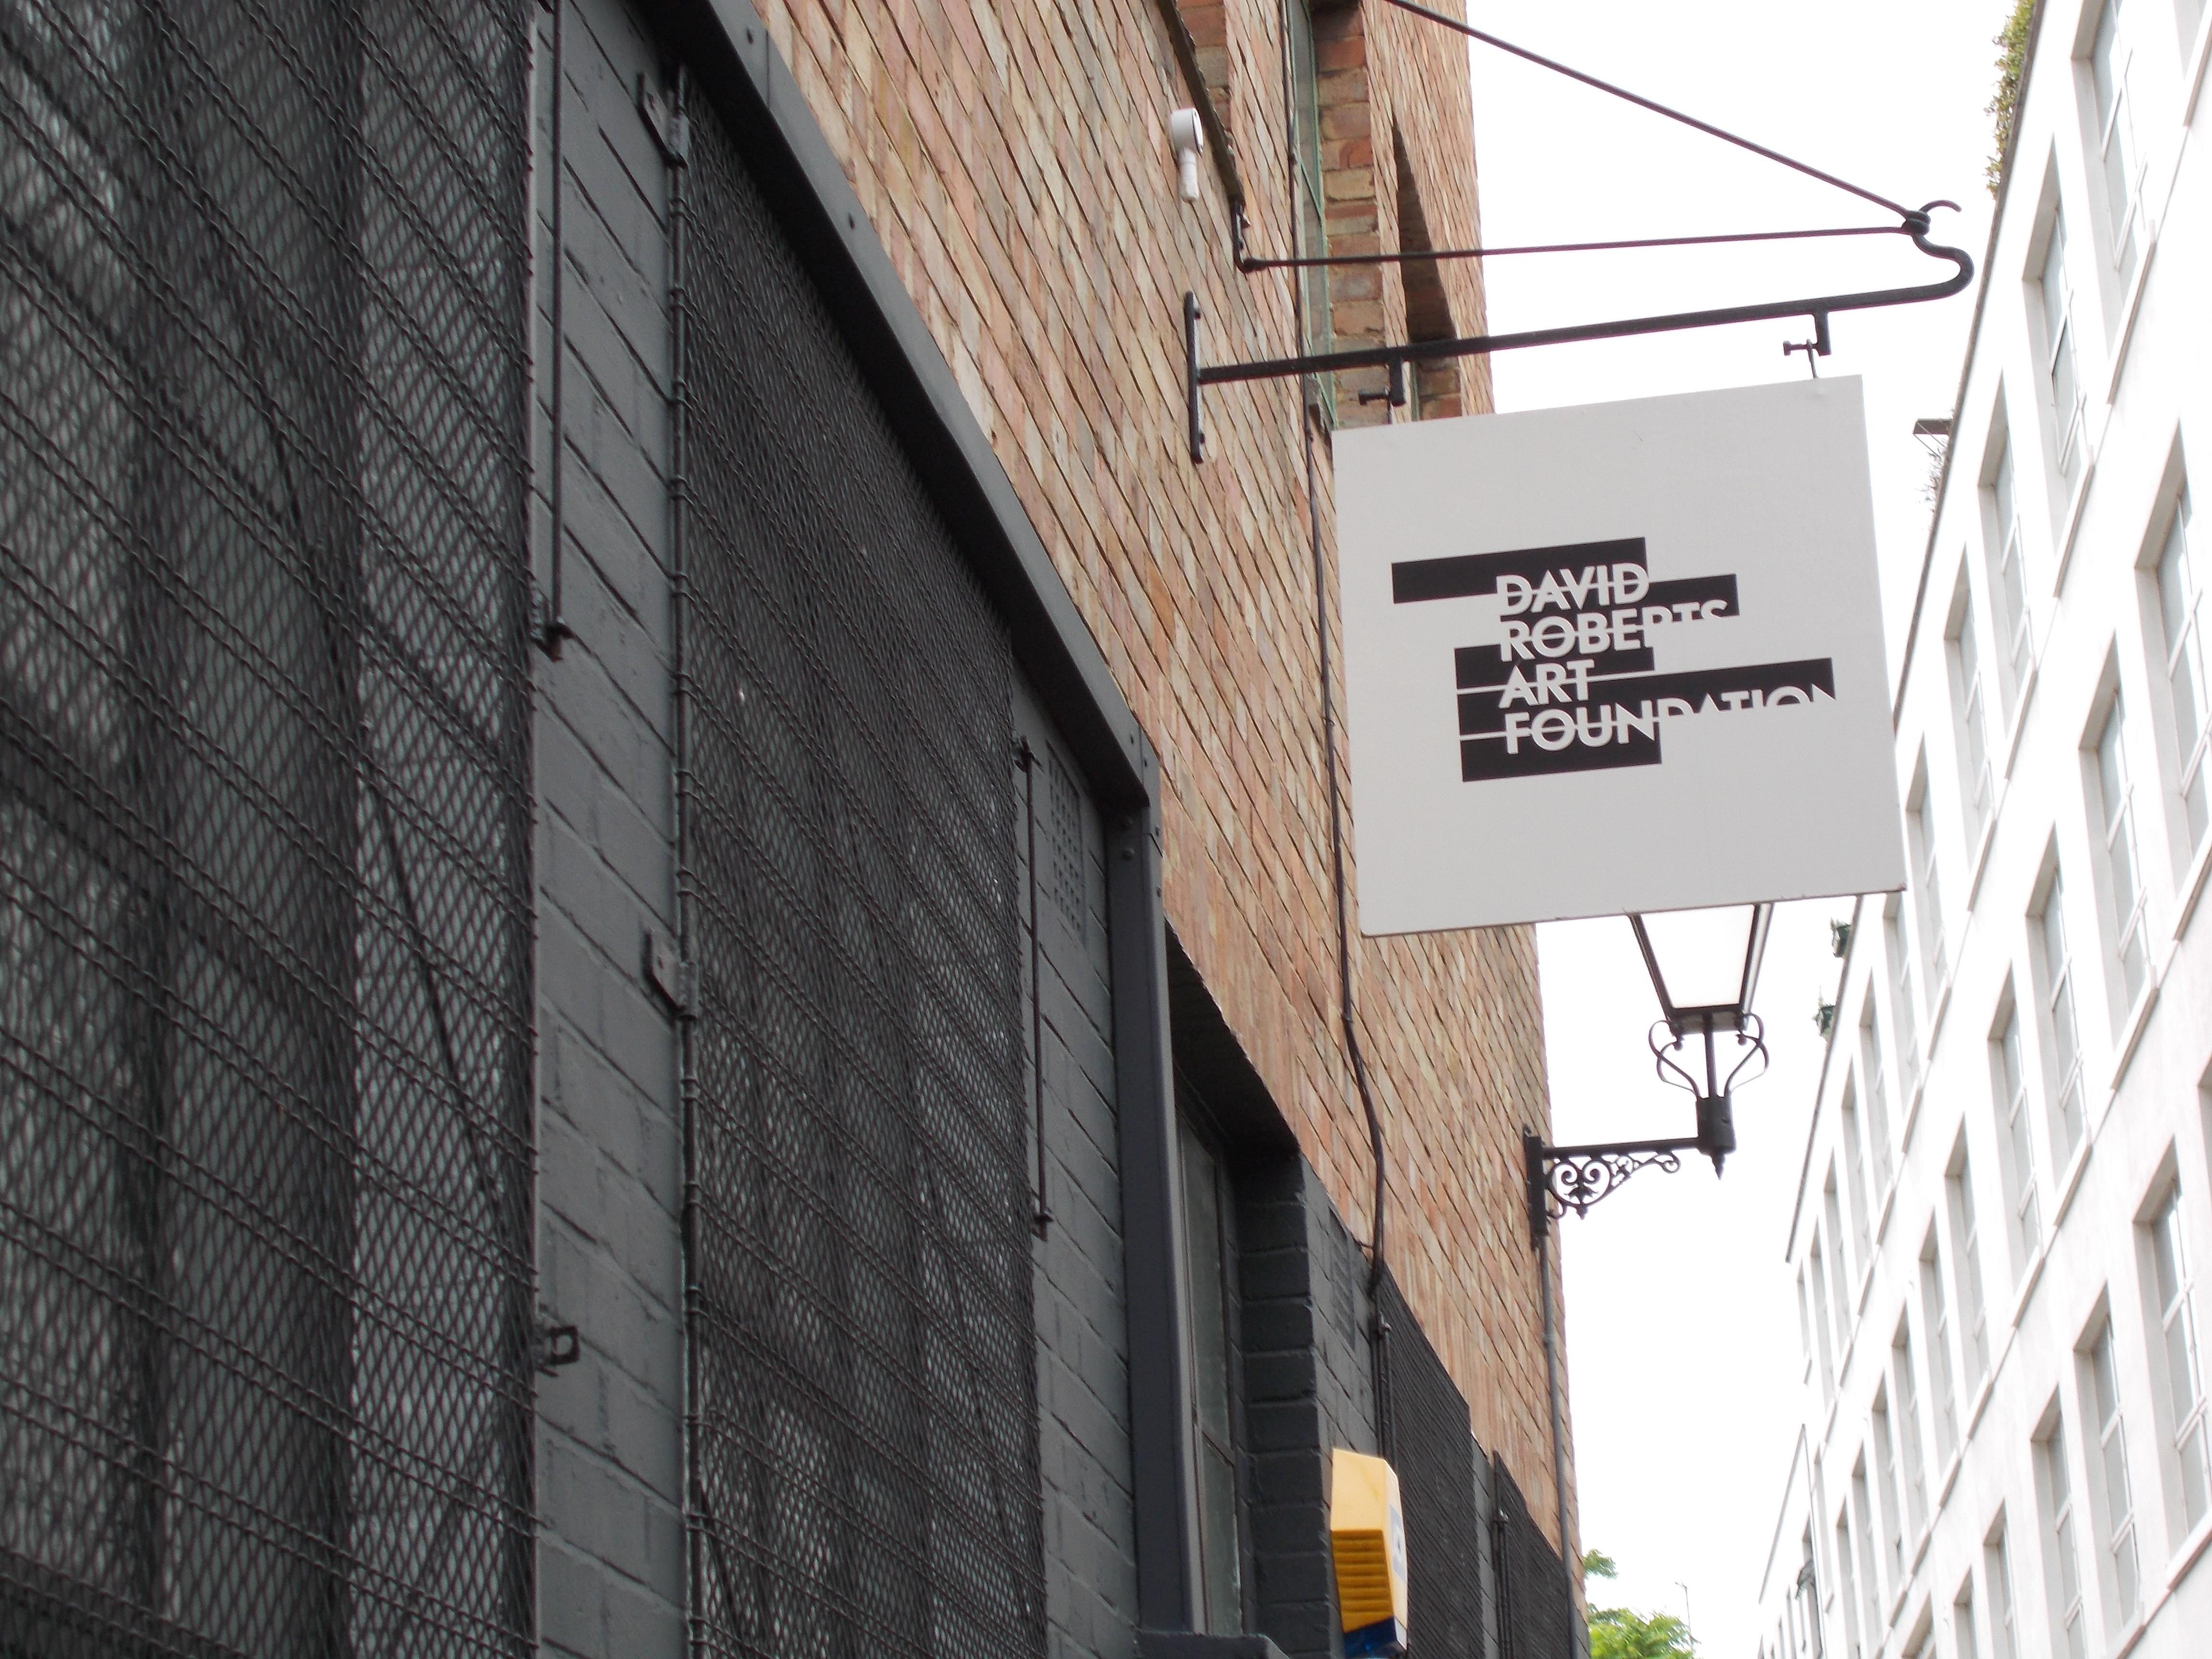 David Roberts Art Foundation